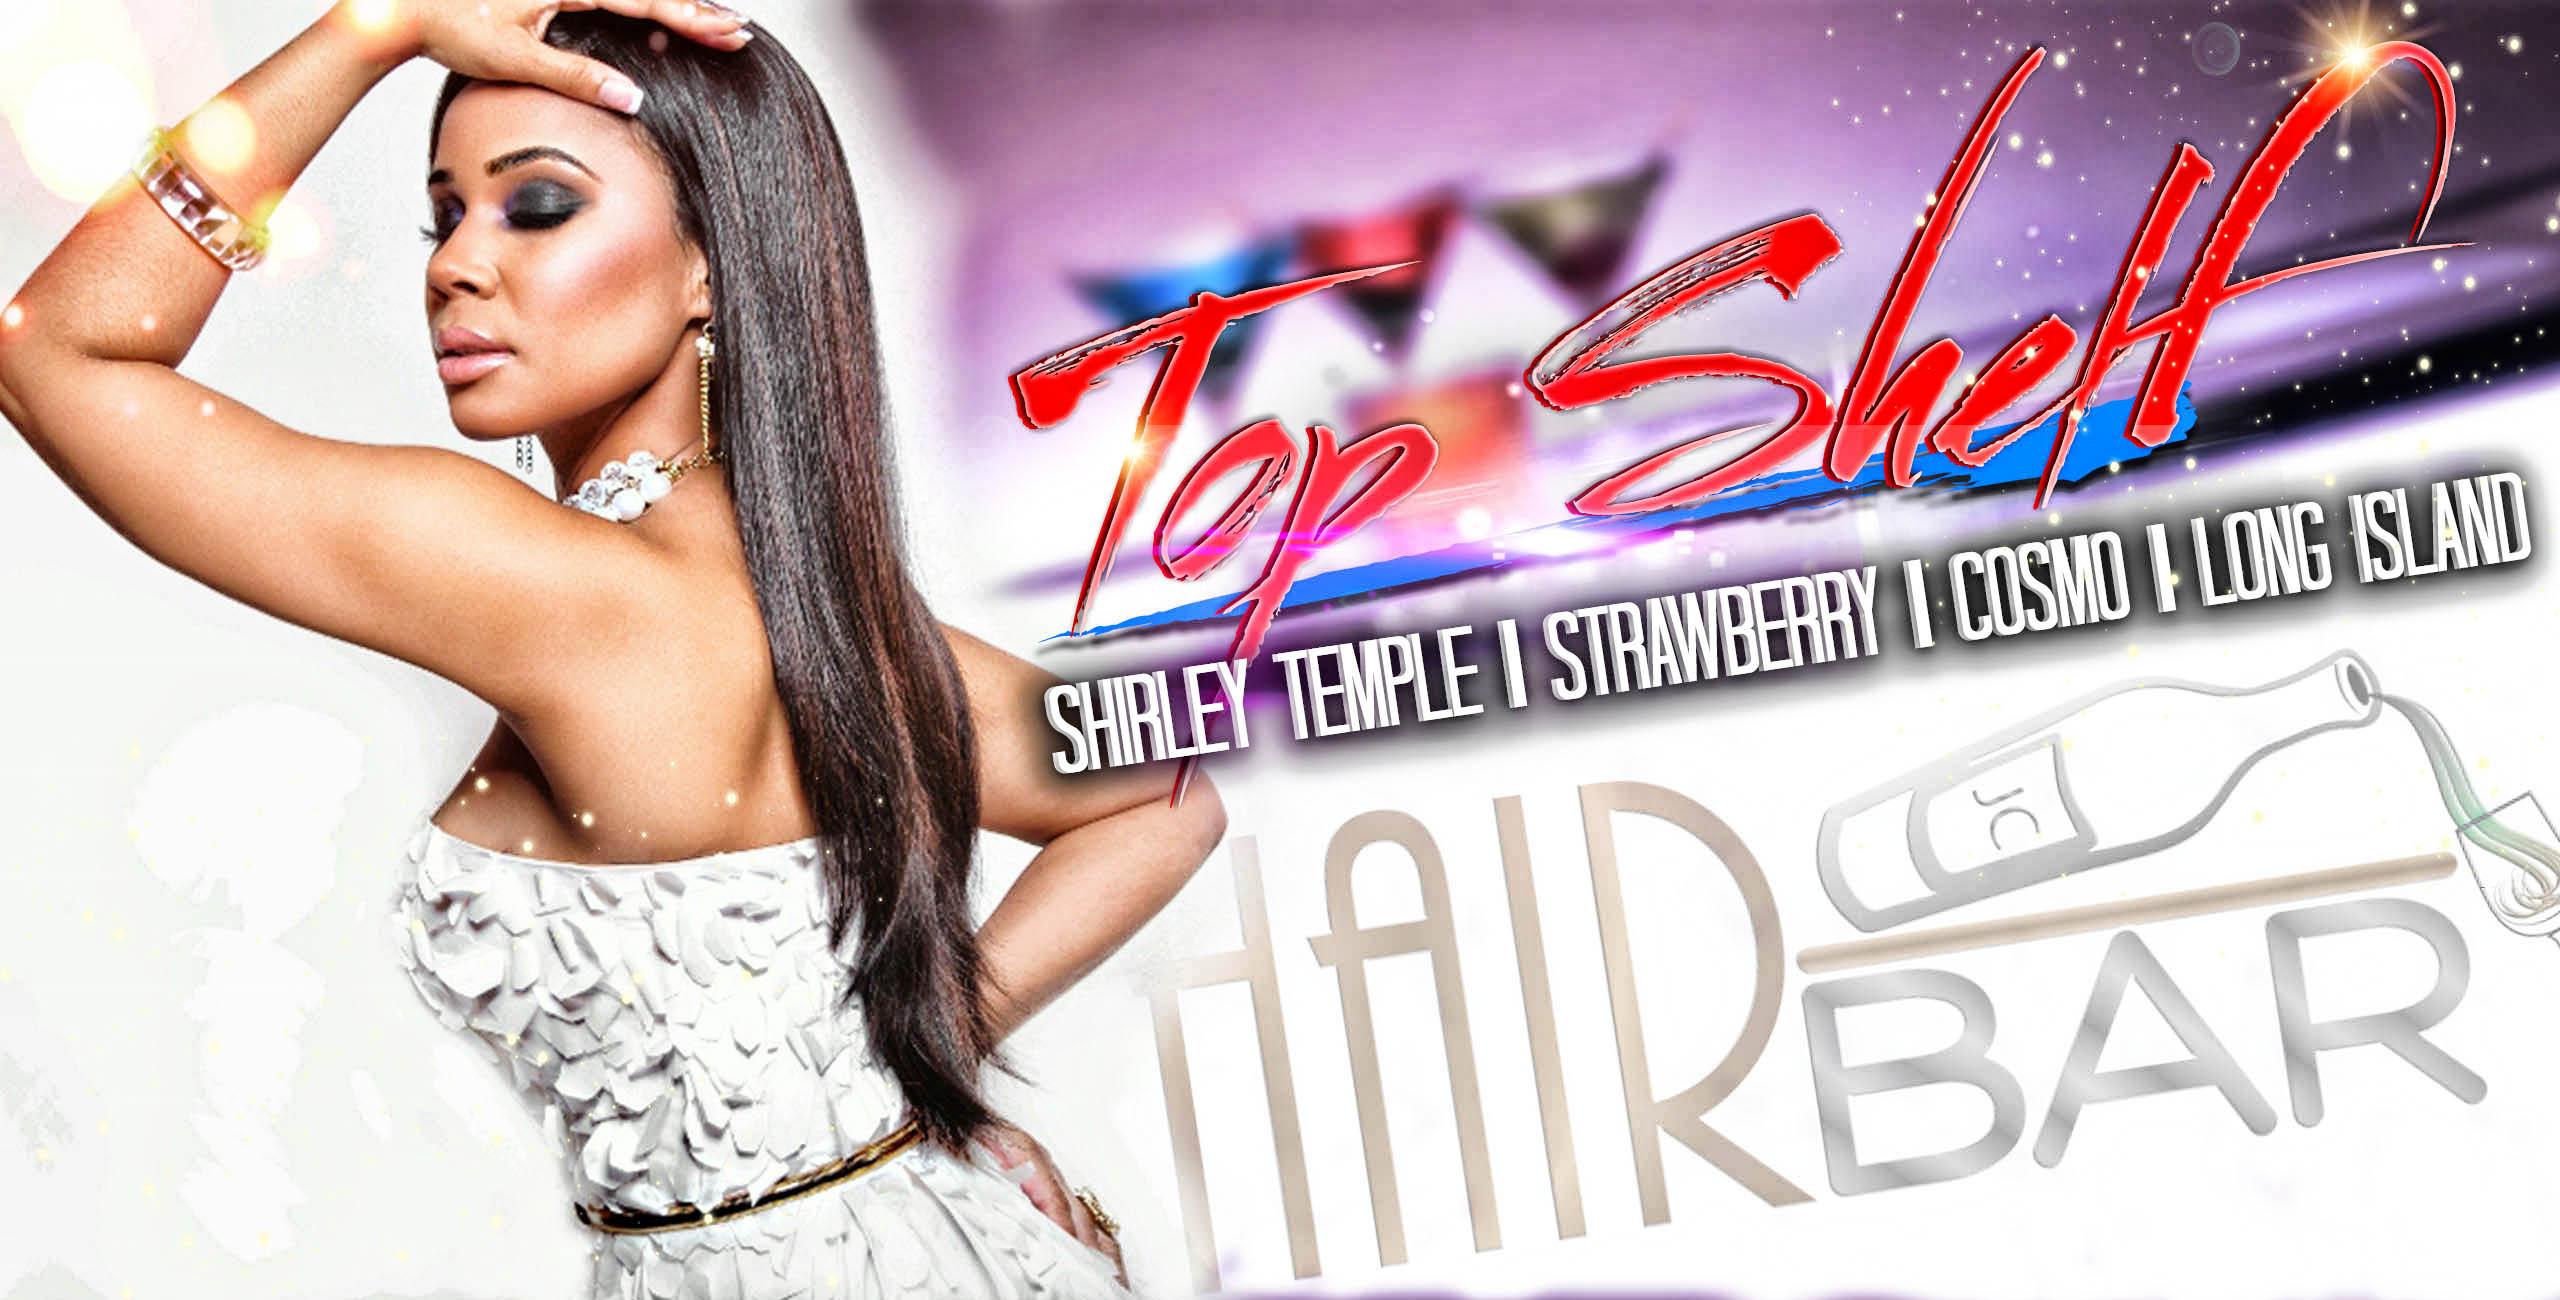 Strawberry Daiquiri 187 Product Categories 187 Hair Bar Online